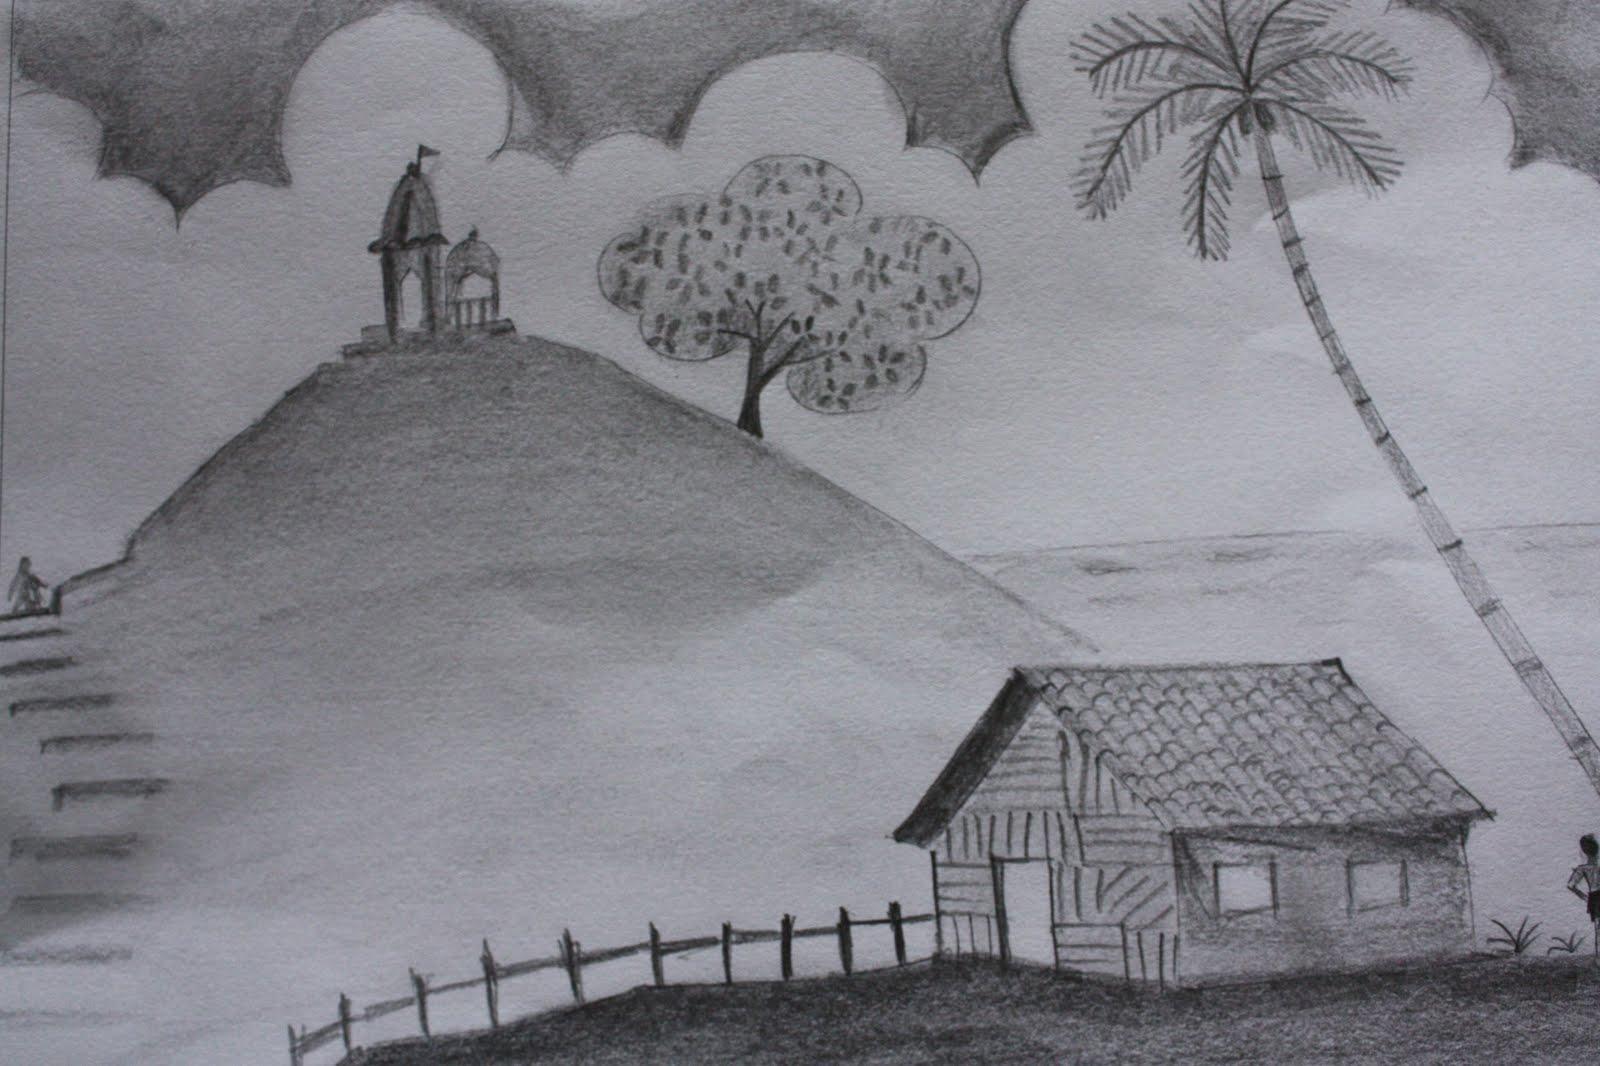 My 1st pencil sketch